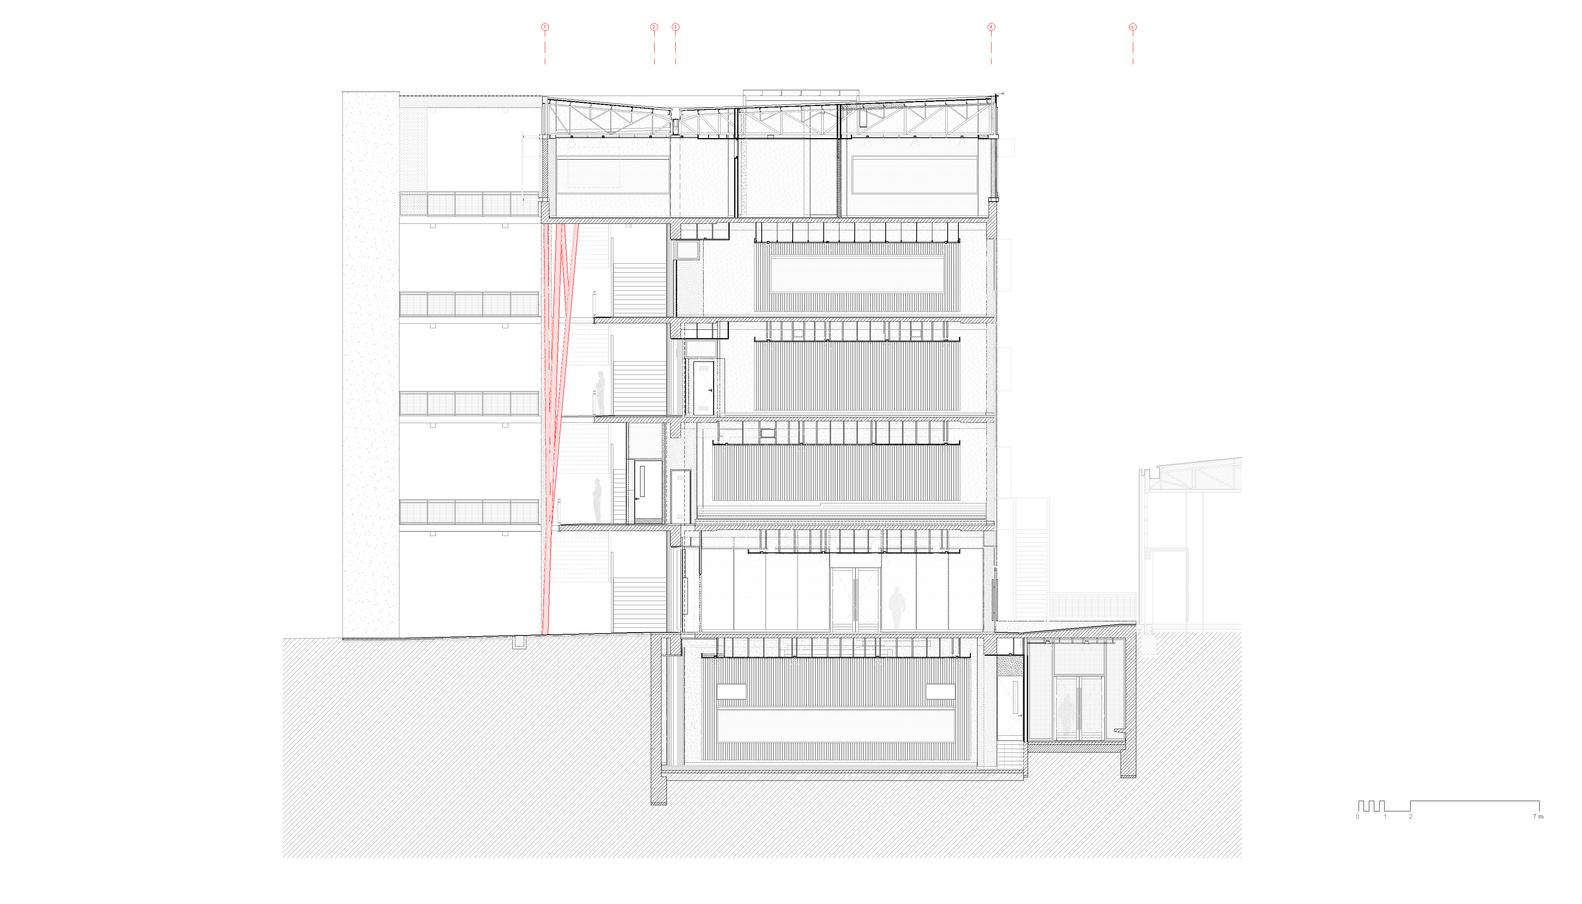 small resolution of edificio de aulas corte aa